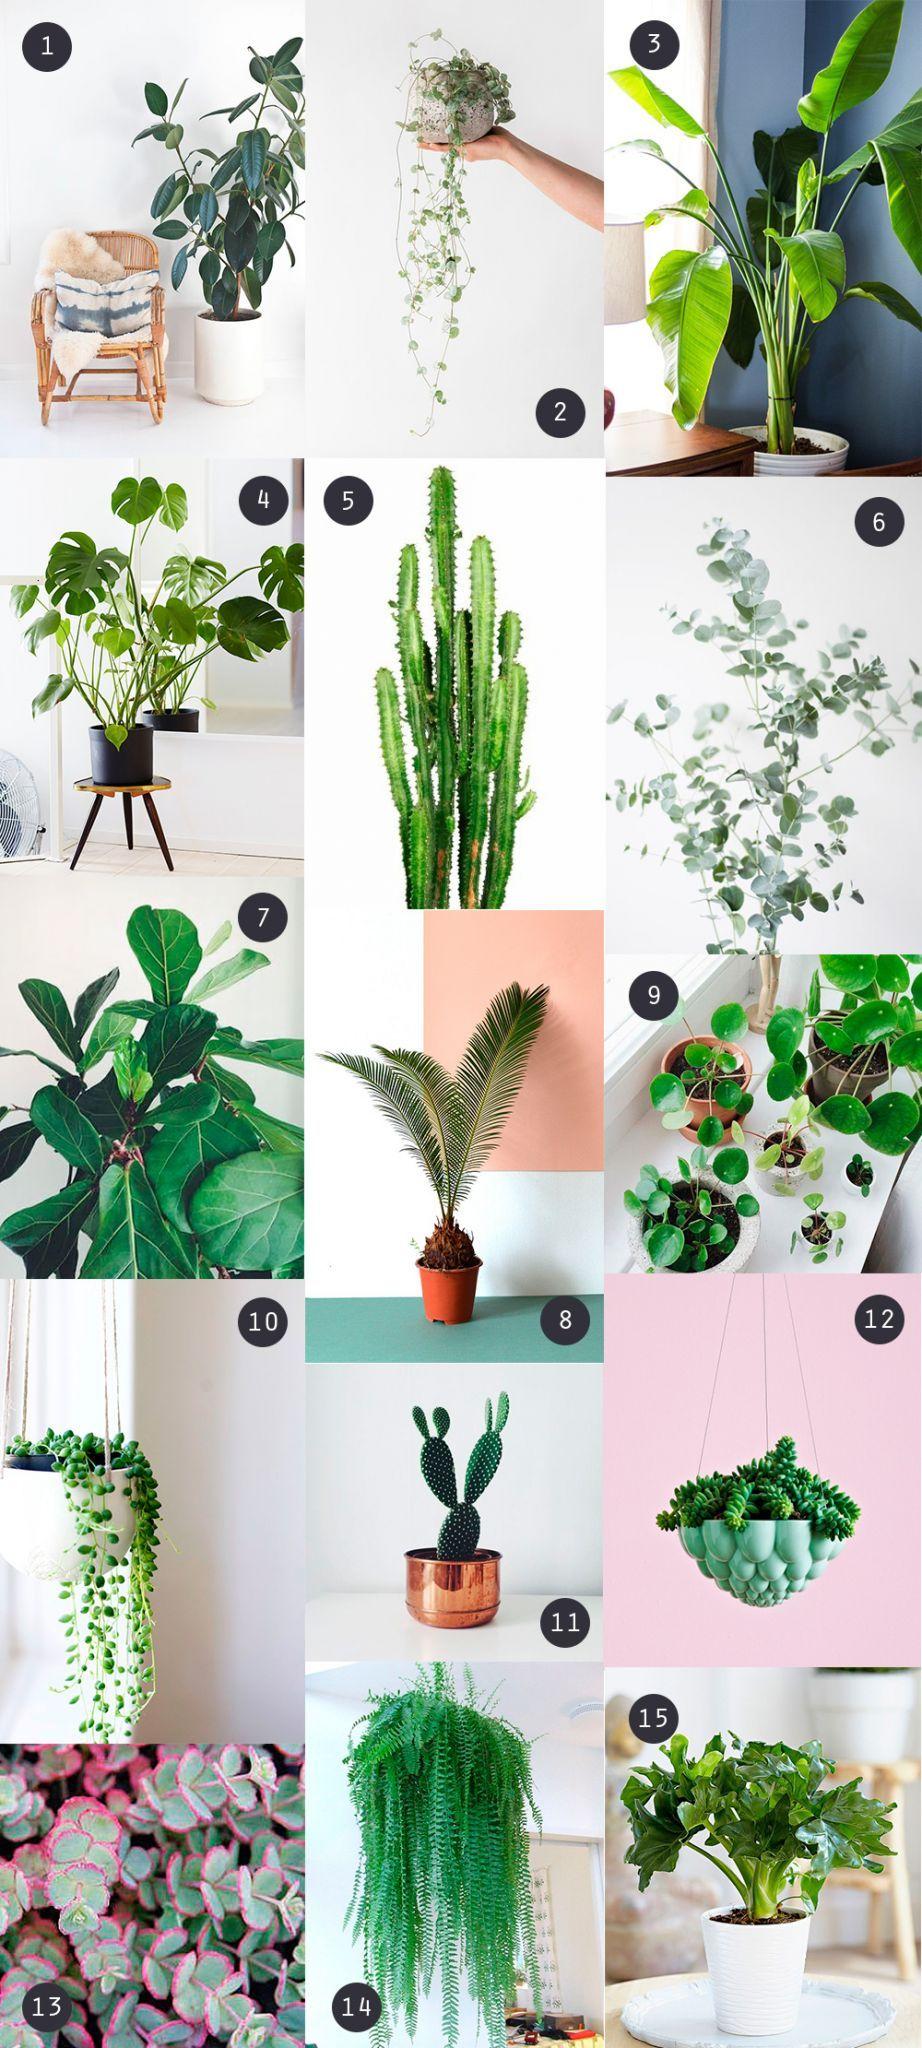 mes plantes vertes pr f r es plantes pinterest. Black Bedroom Furniture Sets. Home Design Ideas